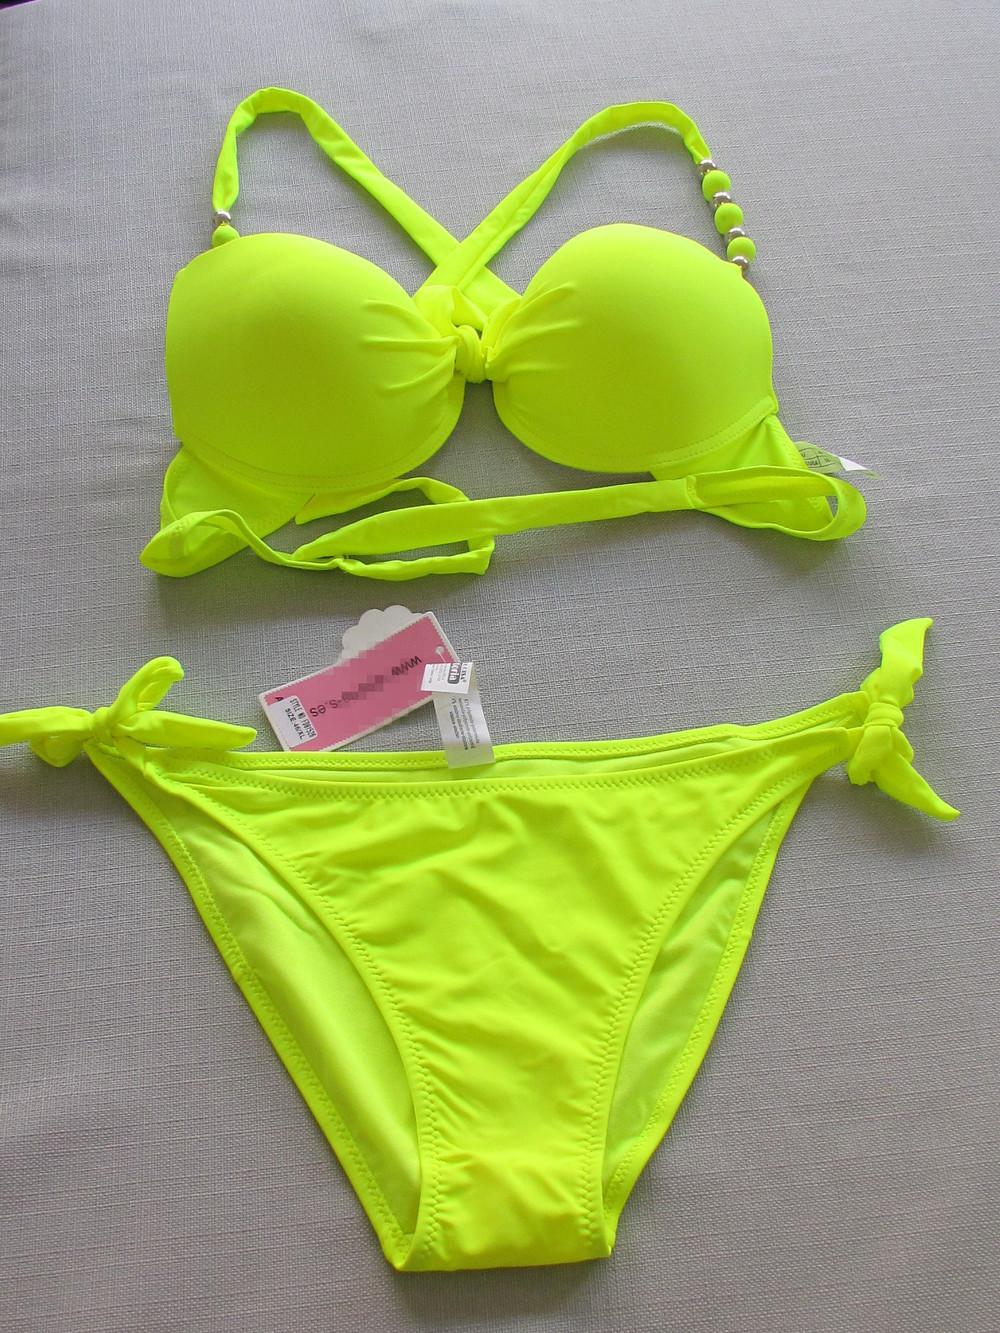 Bikini push up triangle swimsuit swimwear women bikinis set pants side lacing high elastic 19 10